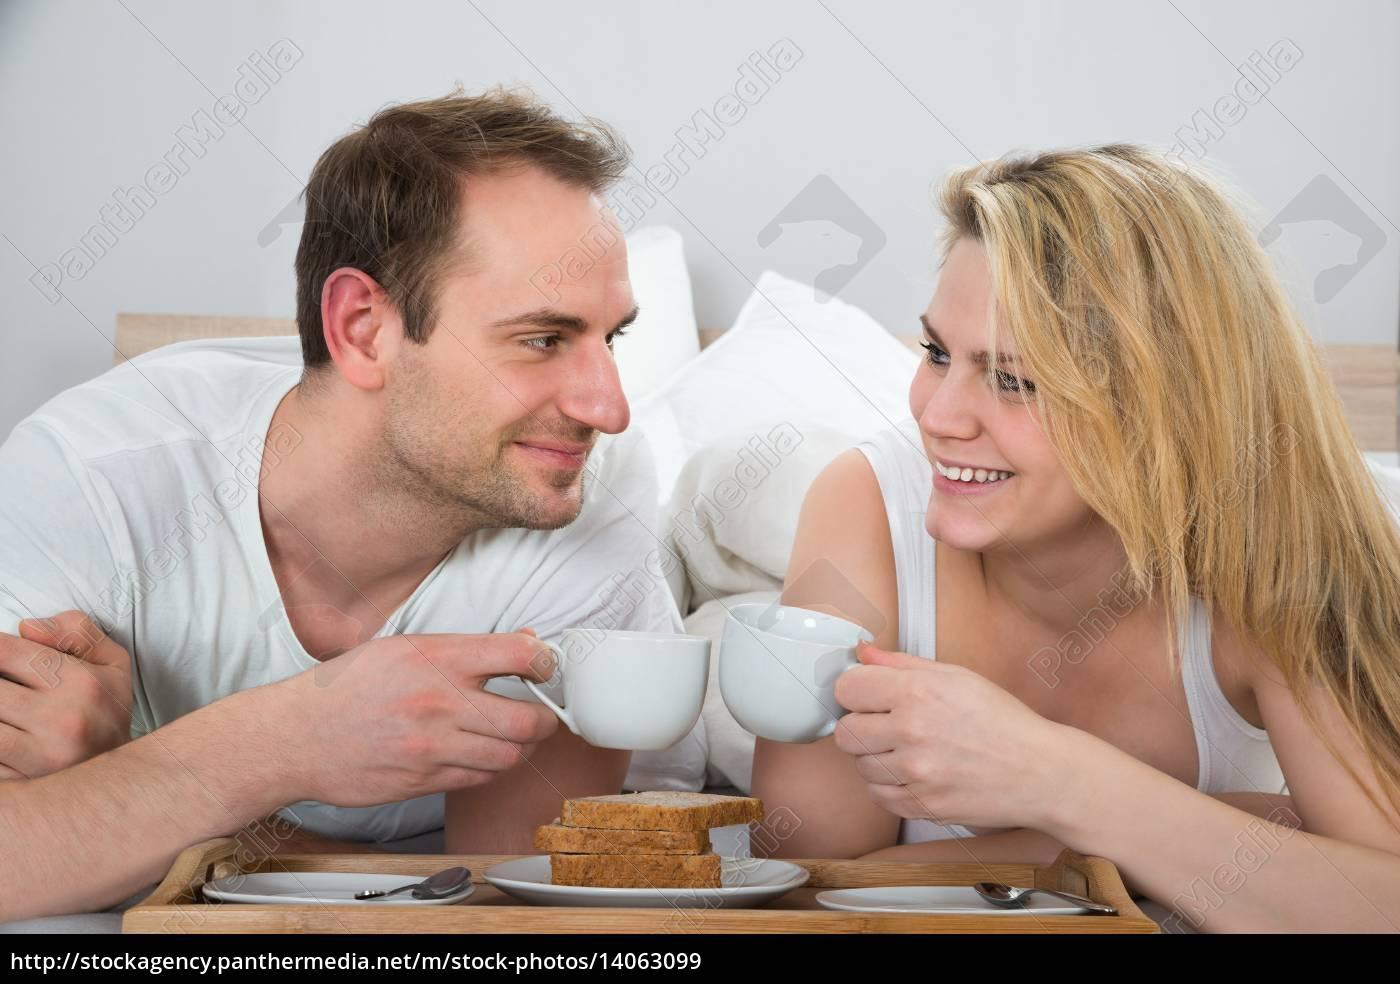 couple, having, breakfast - 14063099